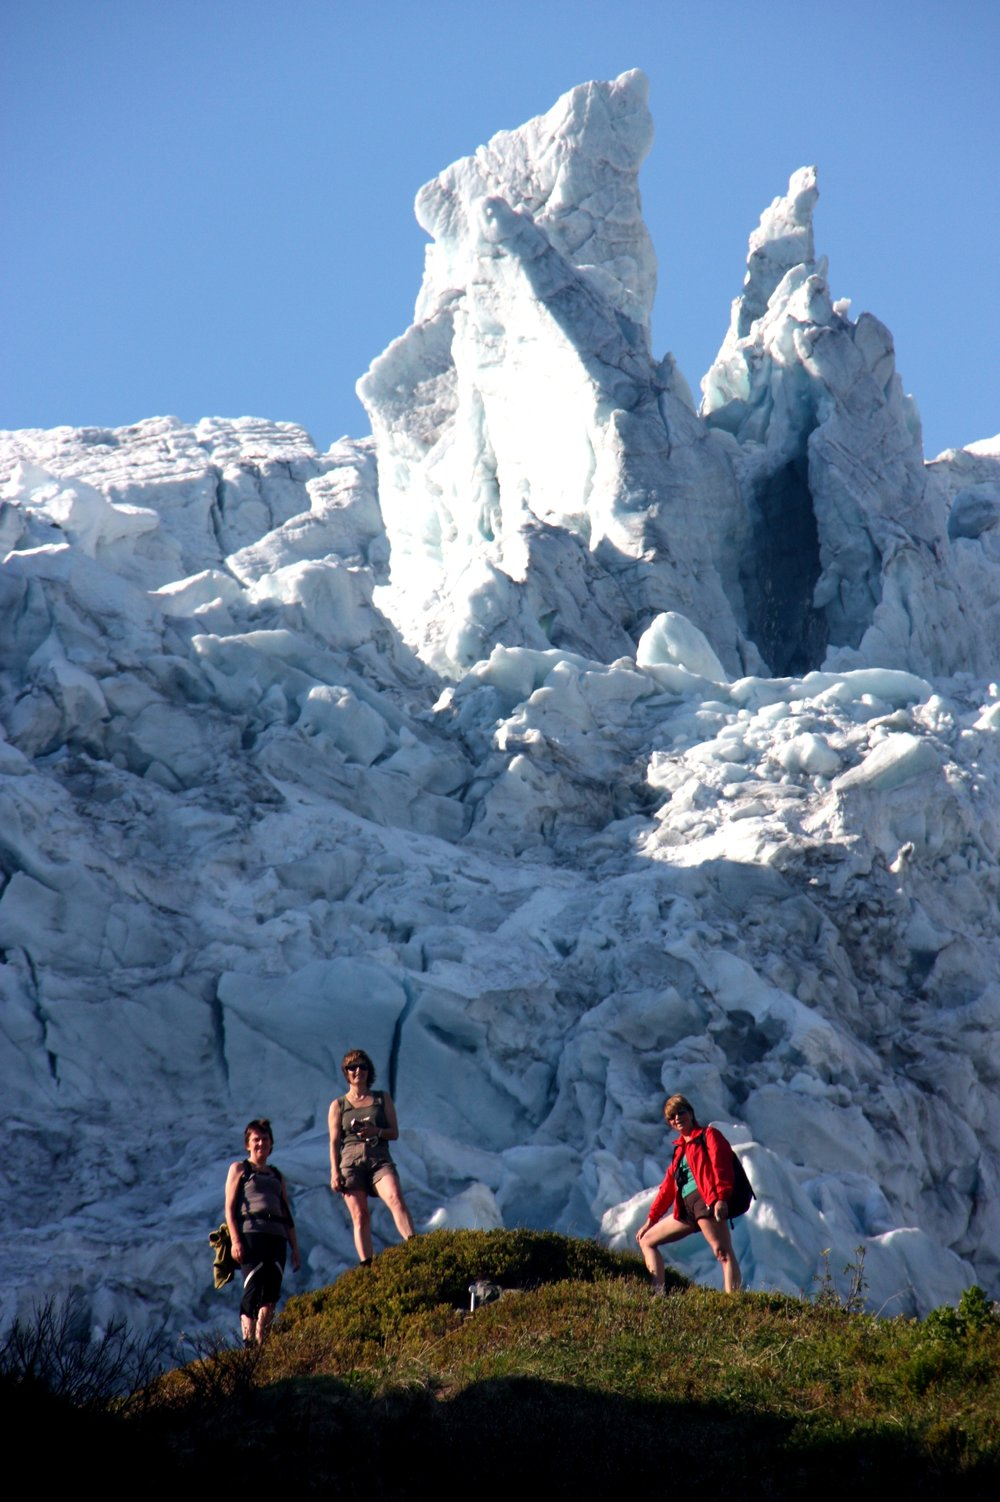 Flatbreen Icefall (Gaute D. Bøyum)